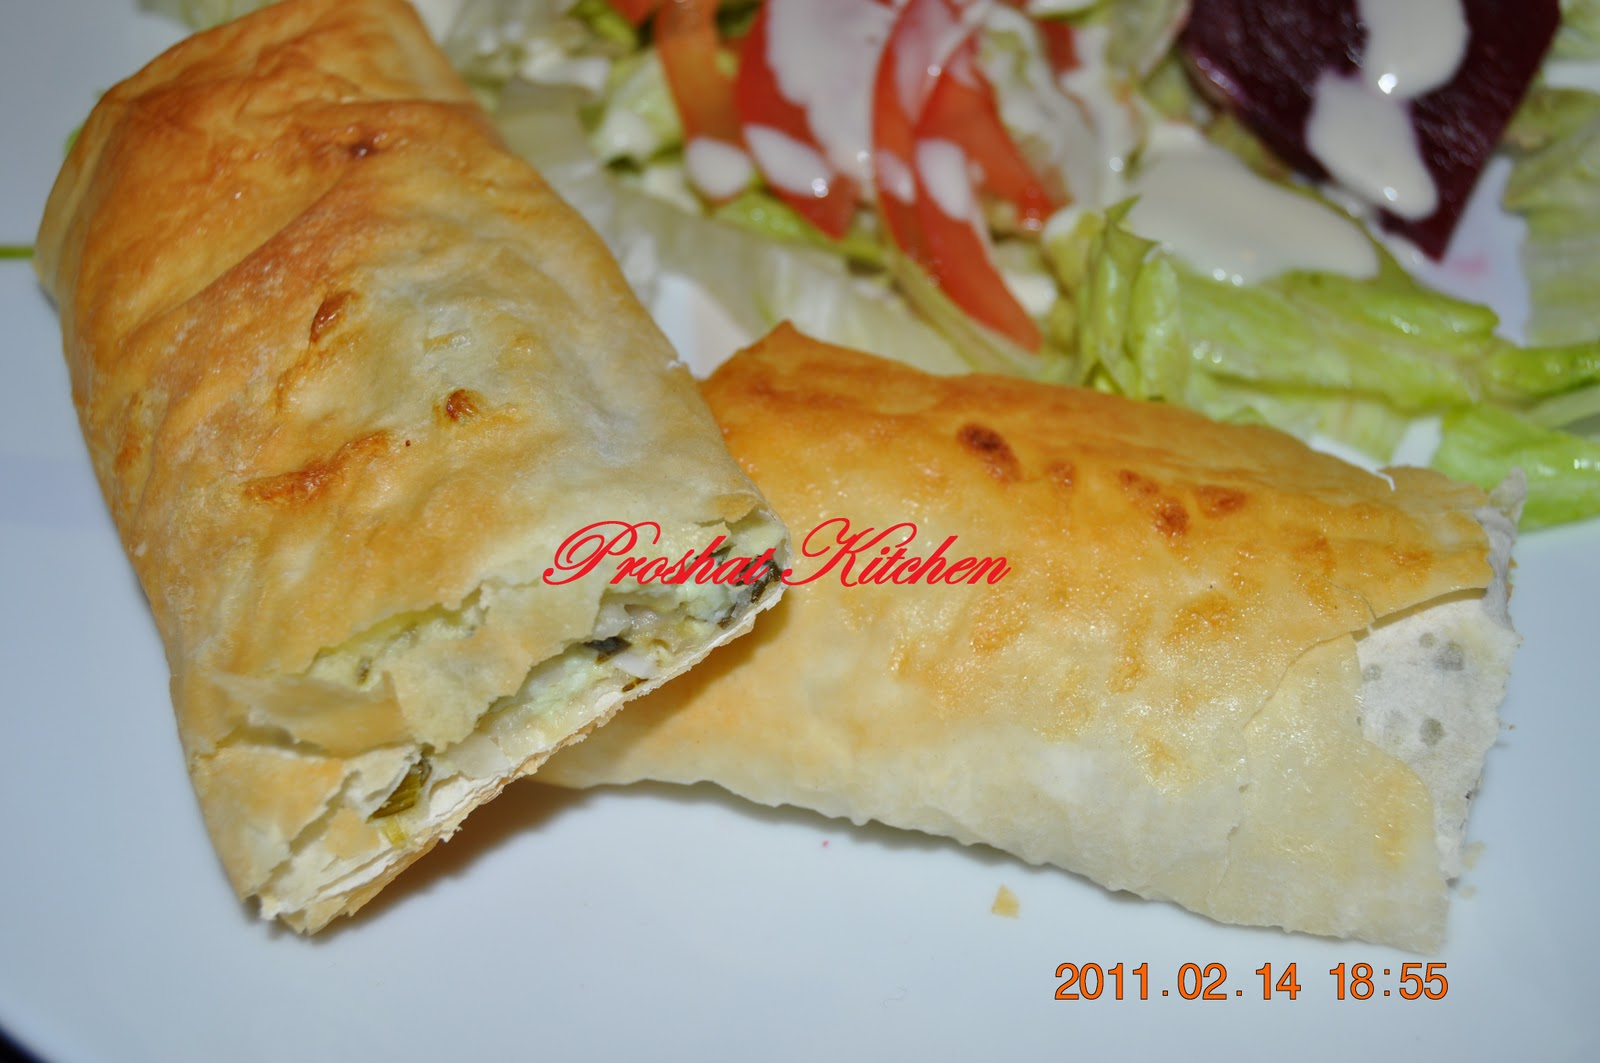 لذت لذت آشپزی: بورک ترکی